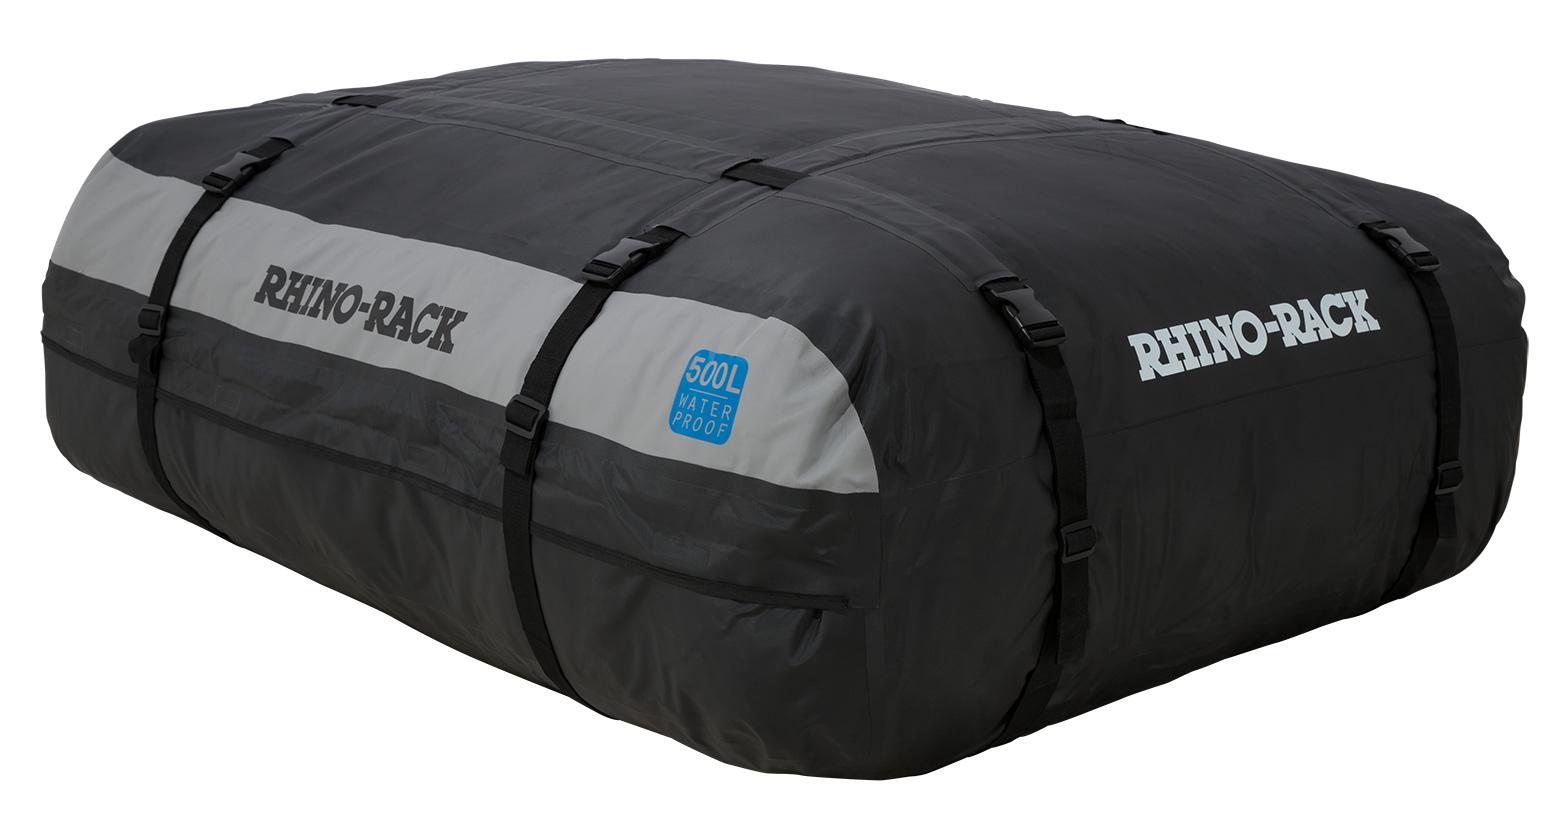 Lb500 Weatherproof Luggage Bag 500l Rhino Rack